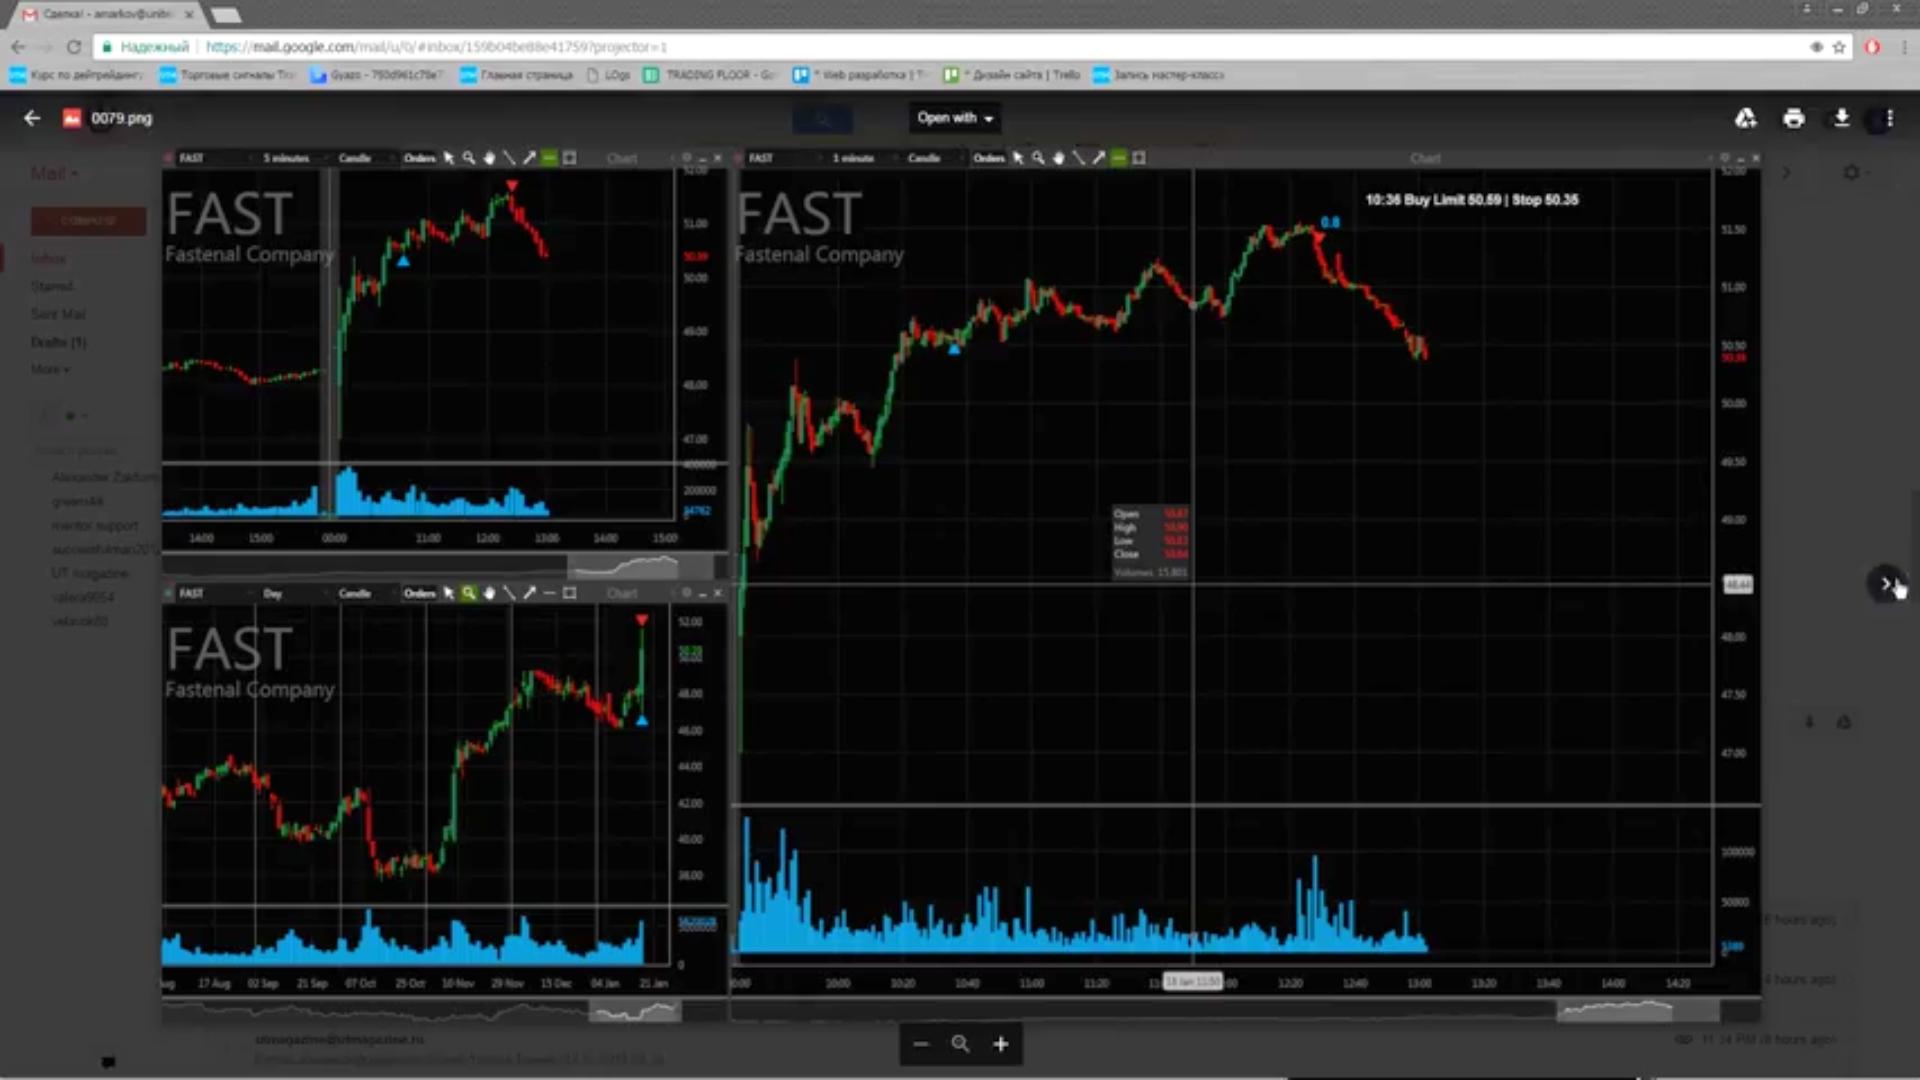 Trading Floor Review 60 - Затишье перед бурей